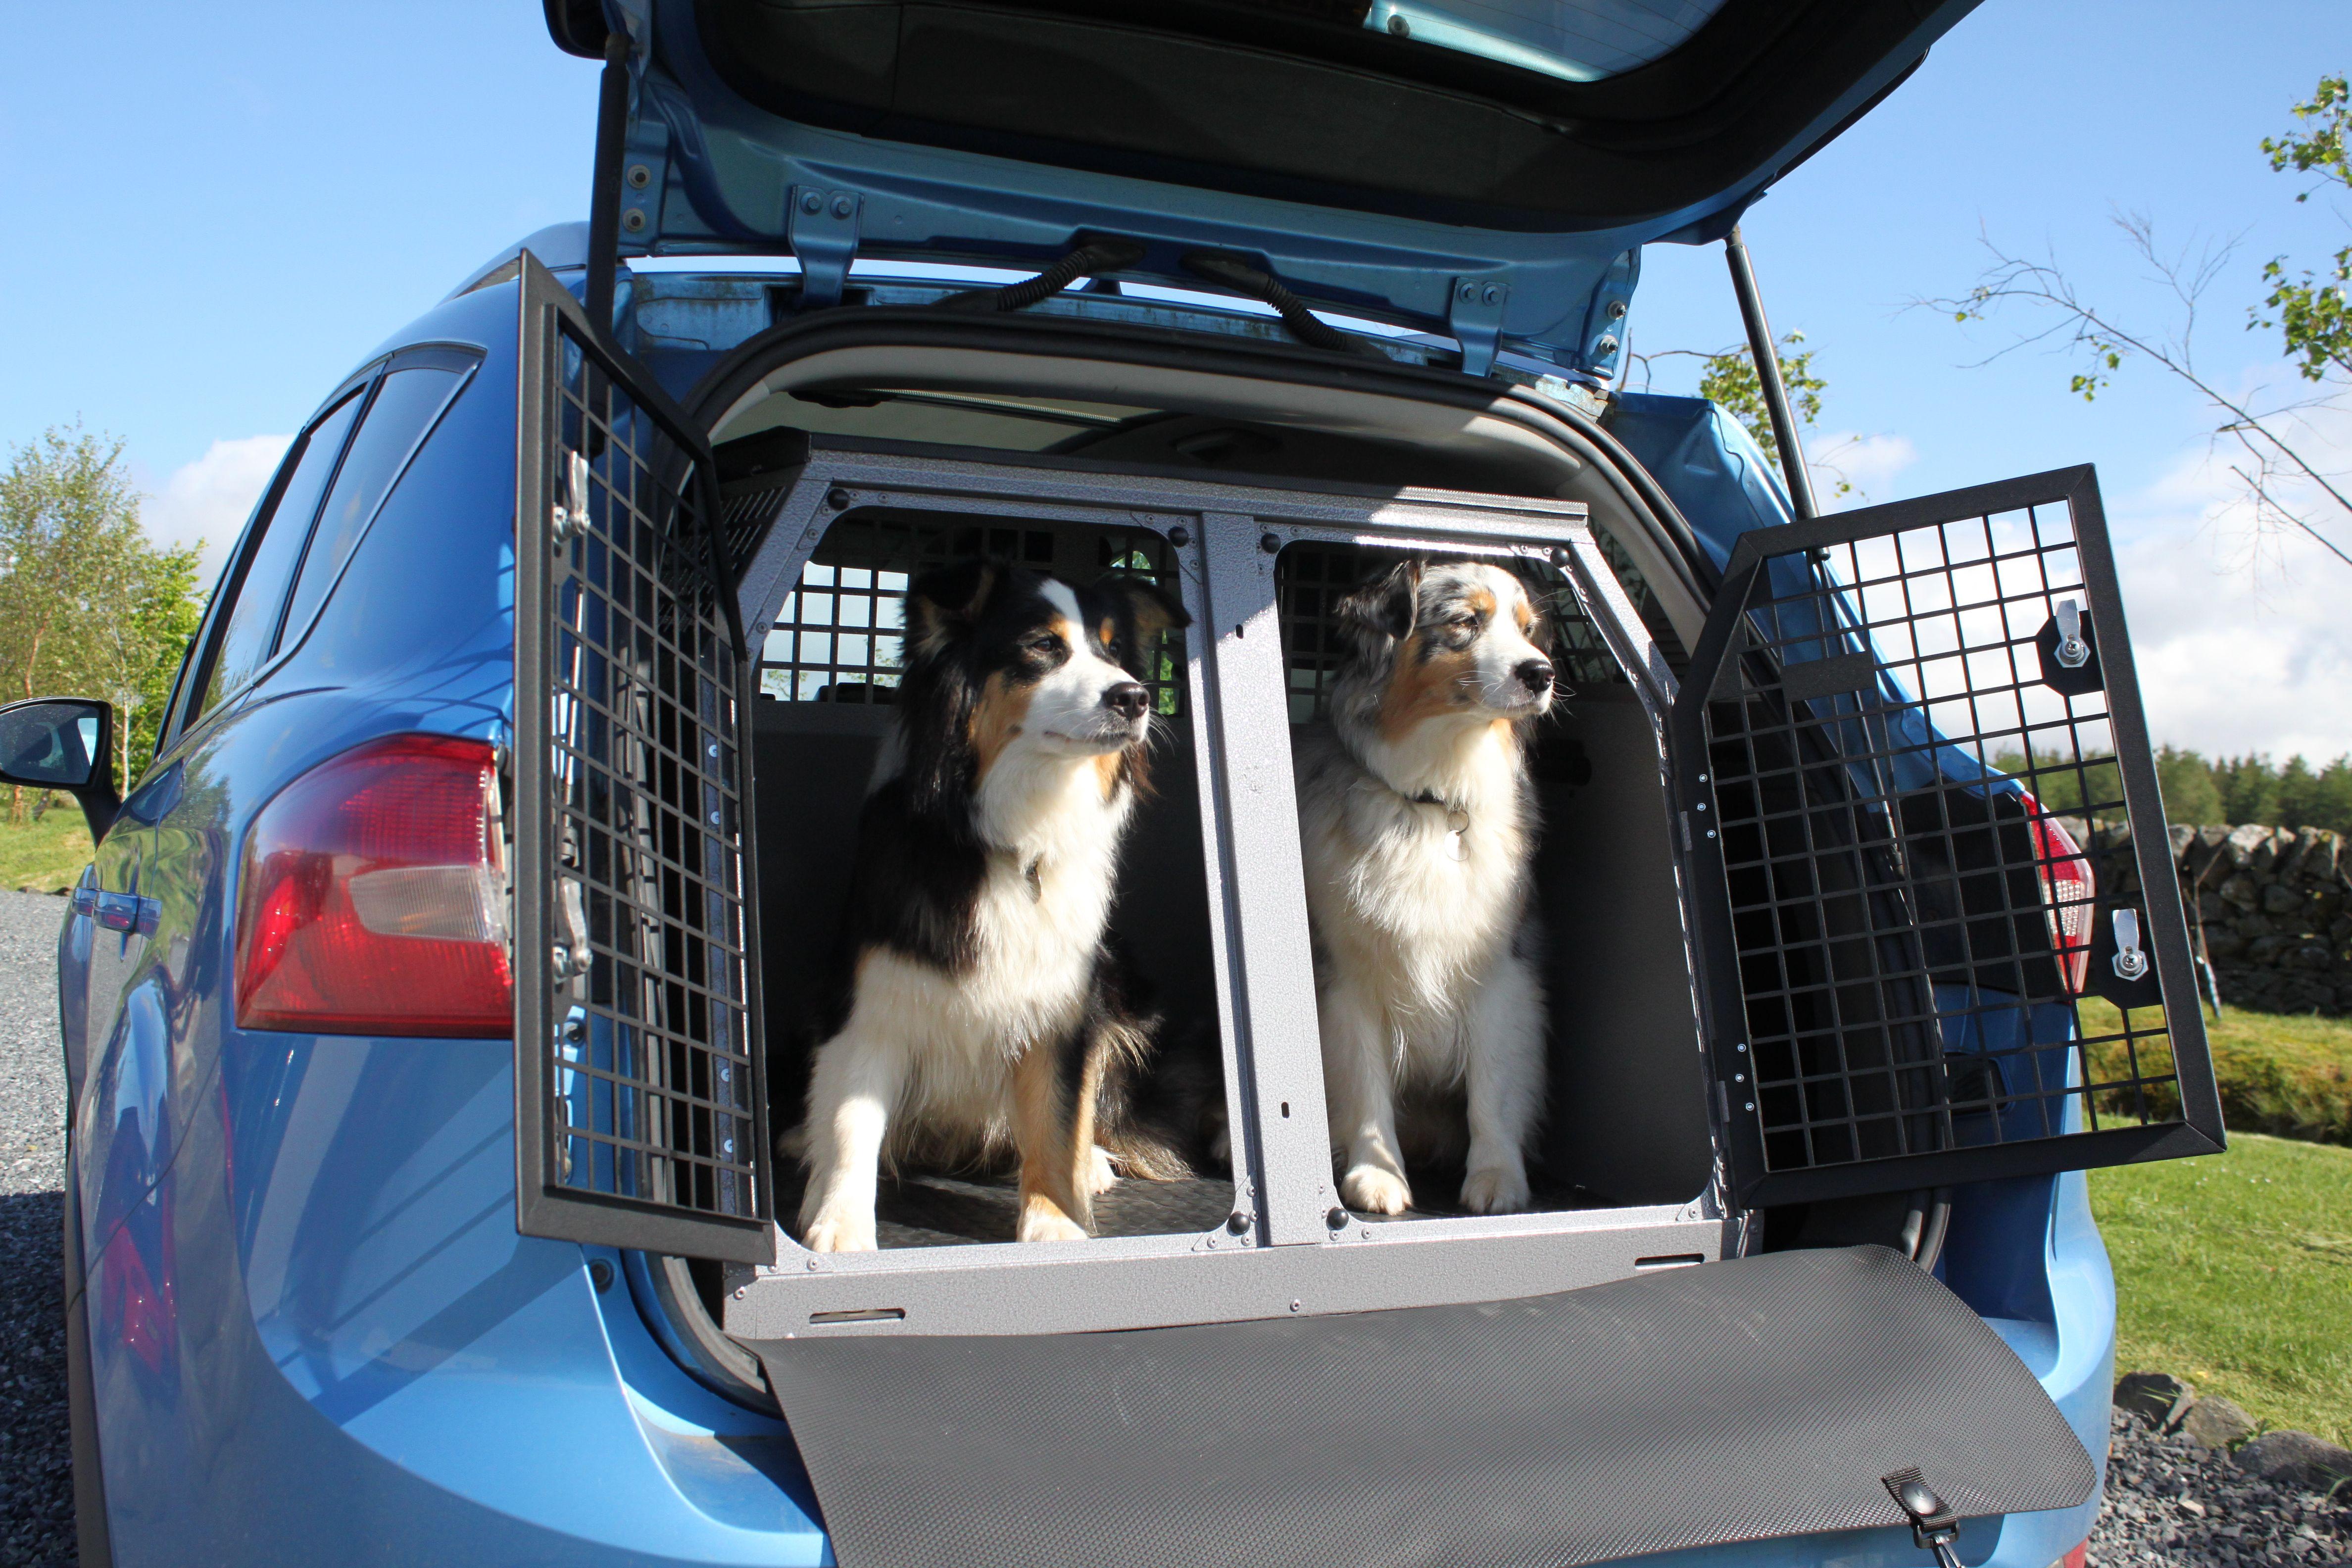 Australian shepherd dogs flurry and roxy in transk9 b21 dog transit box ford